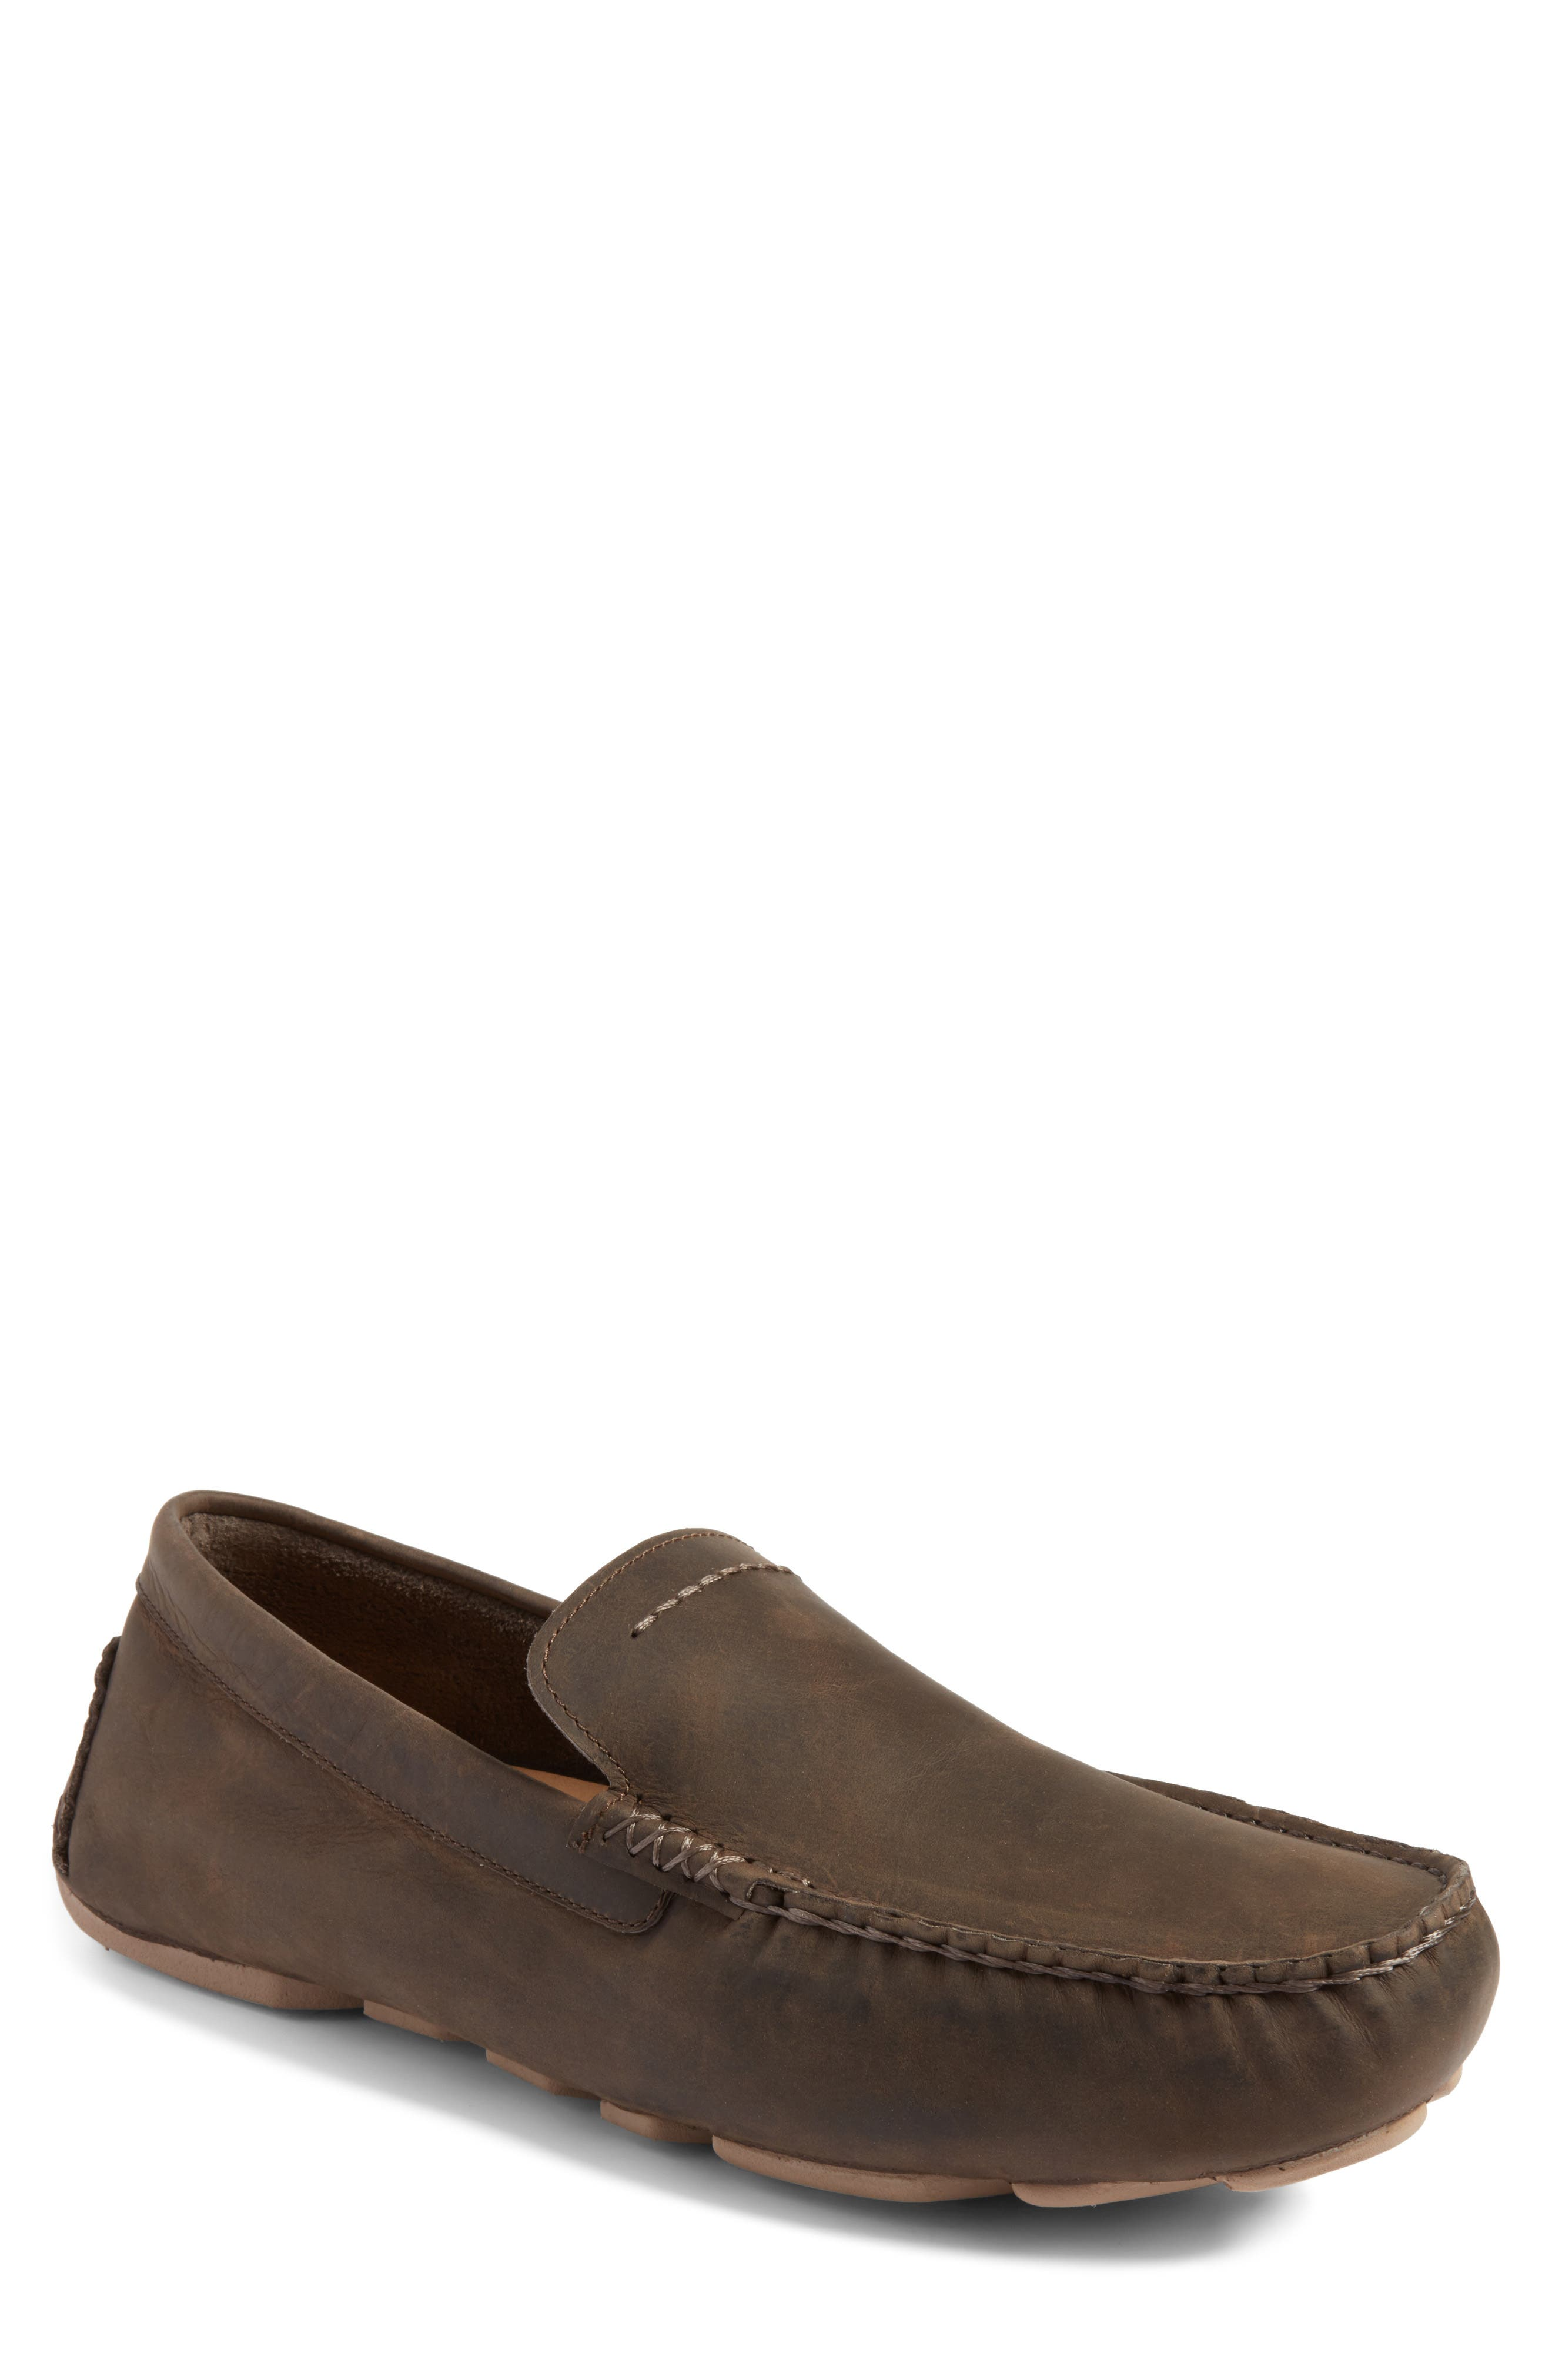 Main Image - UGG® 'Henrick' Driving Shoe (Men)